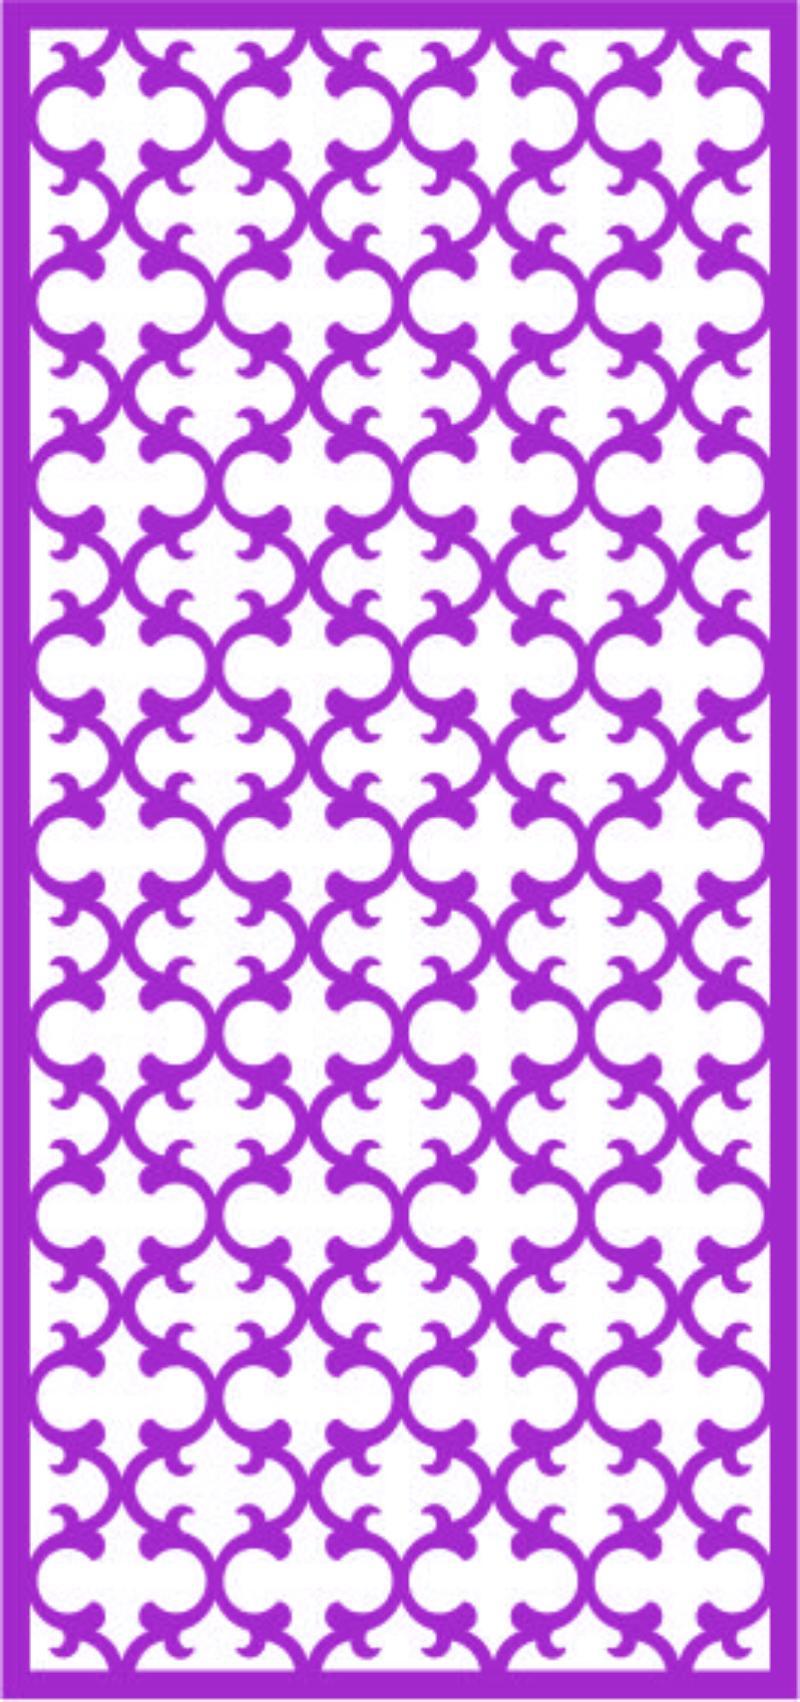 Laser Cut Pattern – 1568 Free CDR Vectors Art